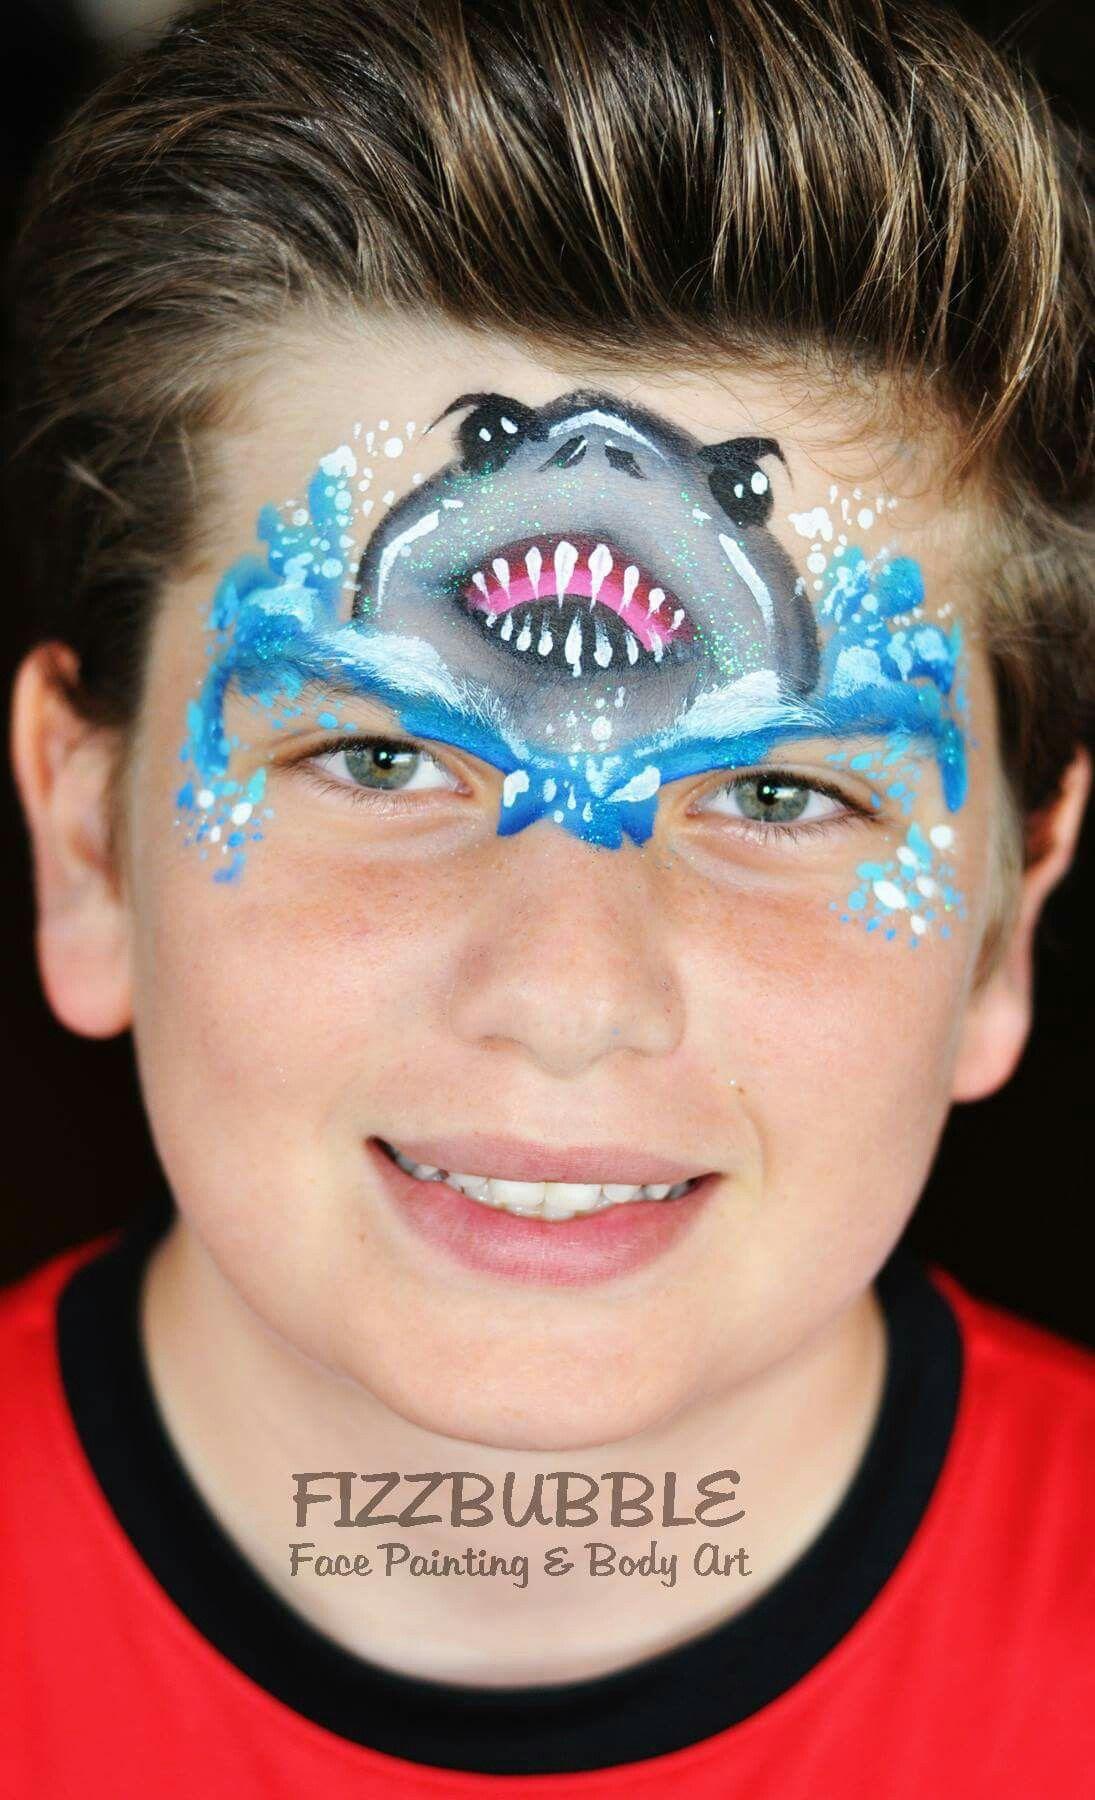 Uncategorized Boy Face Painting Ideas jo bertram shark face painting design facepainting ideas kids design